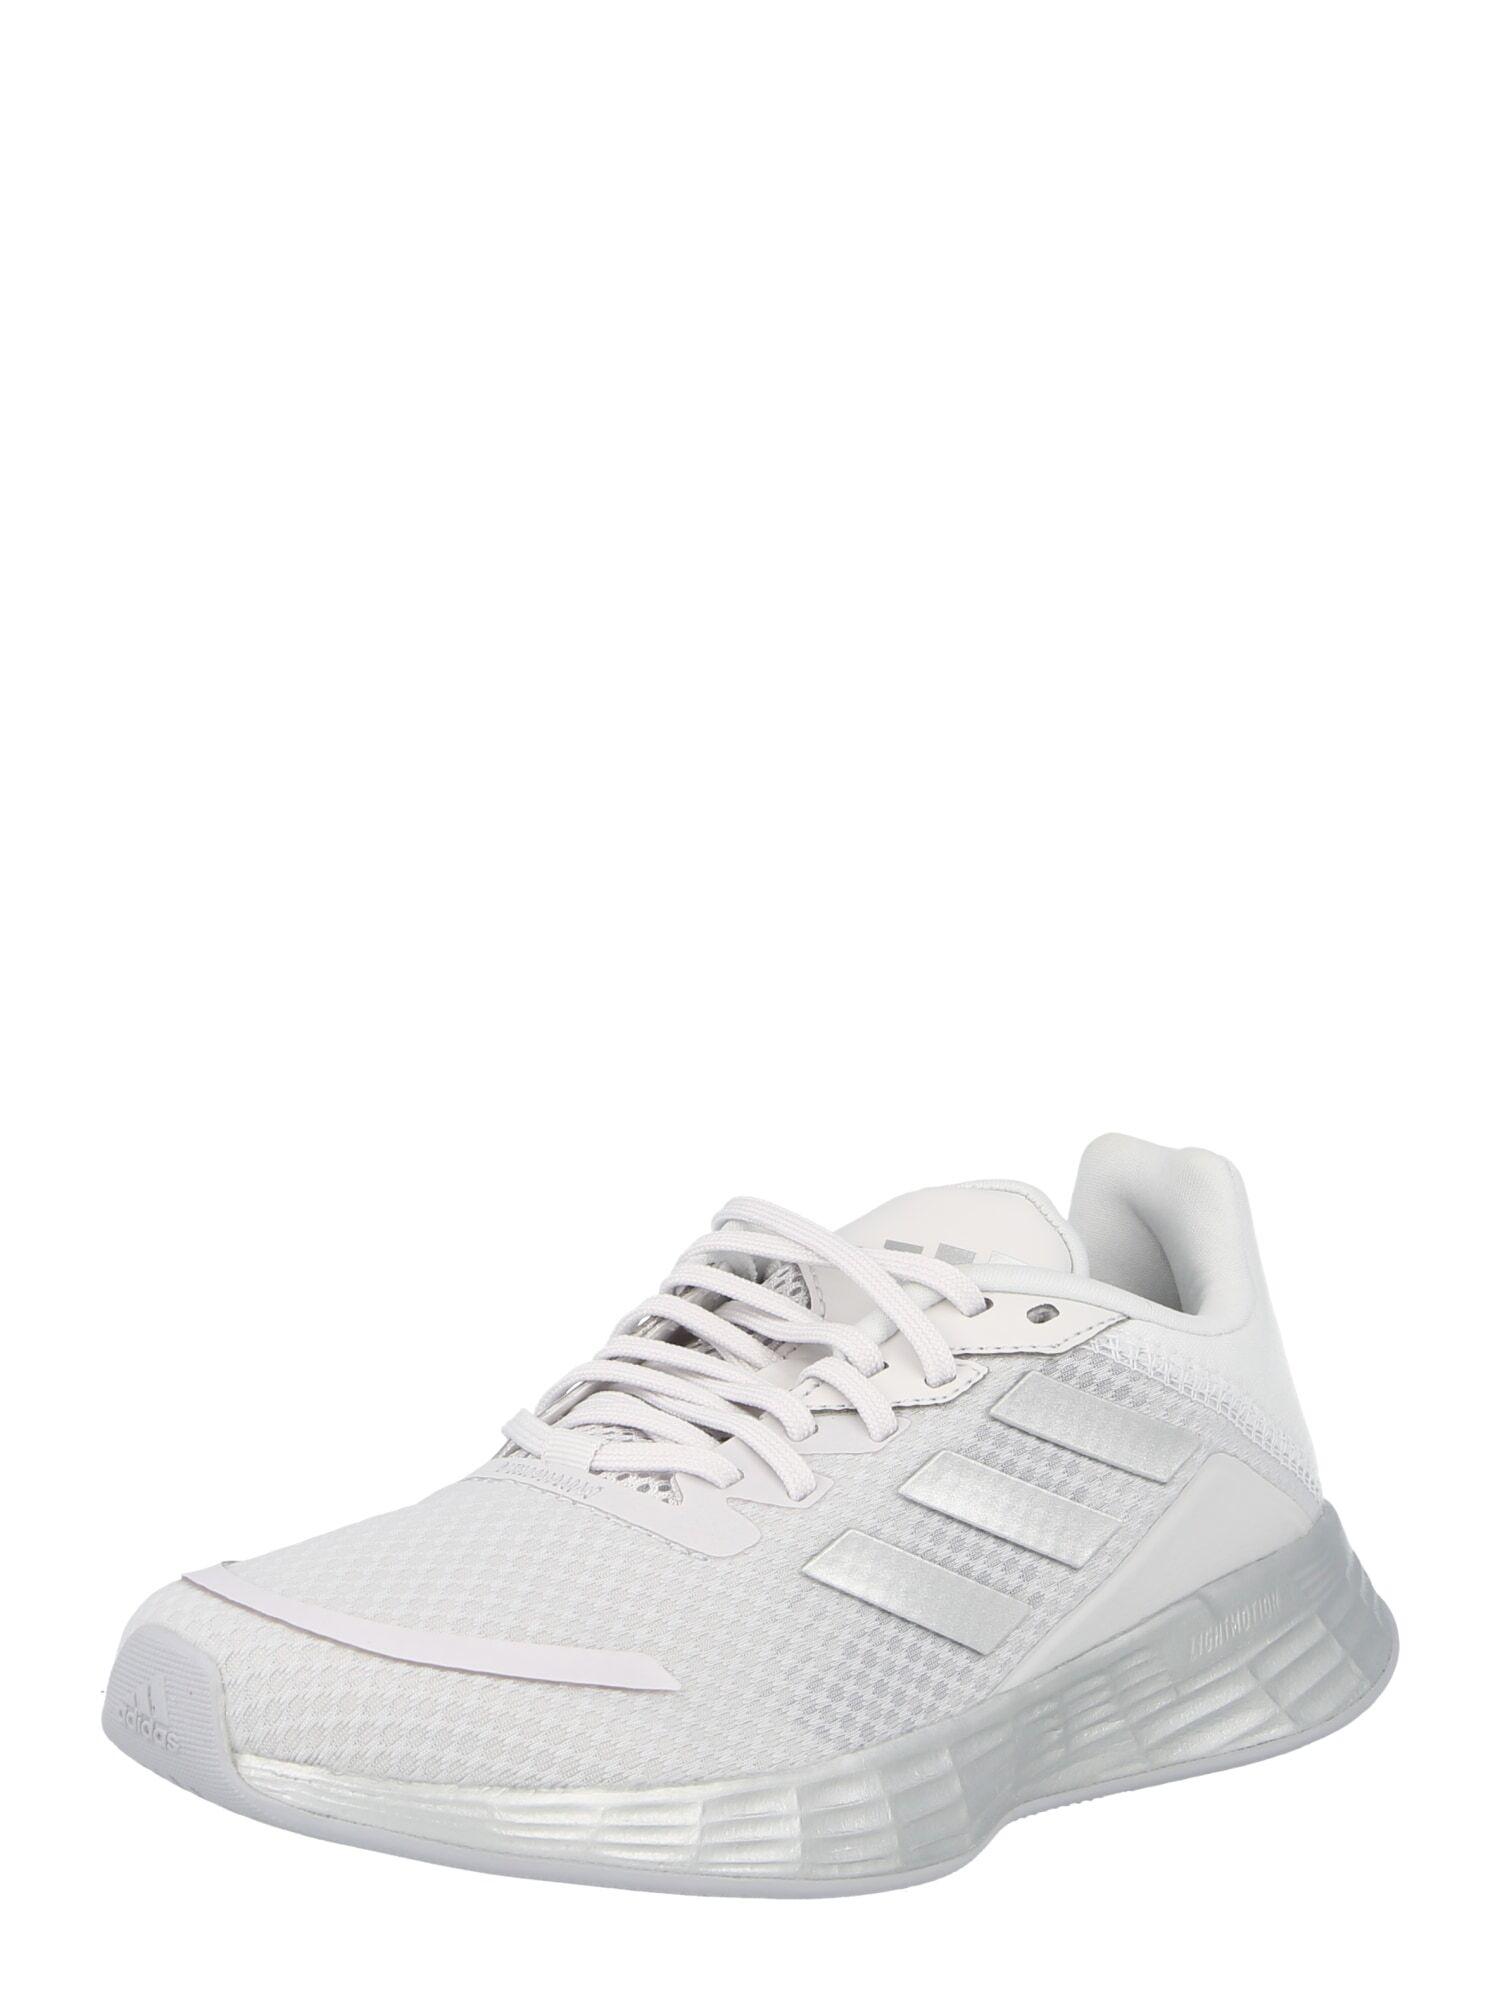 ADIDAS PERFORMANCE Chaussure de course 'Duramo'  - Blanc - Taille: 9 - female